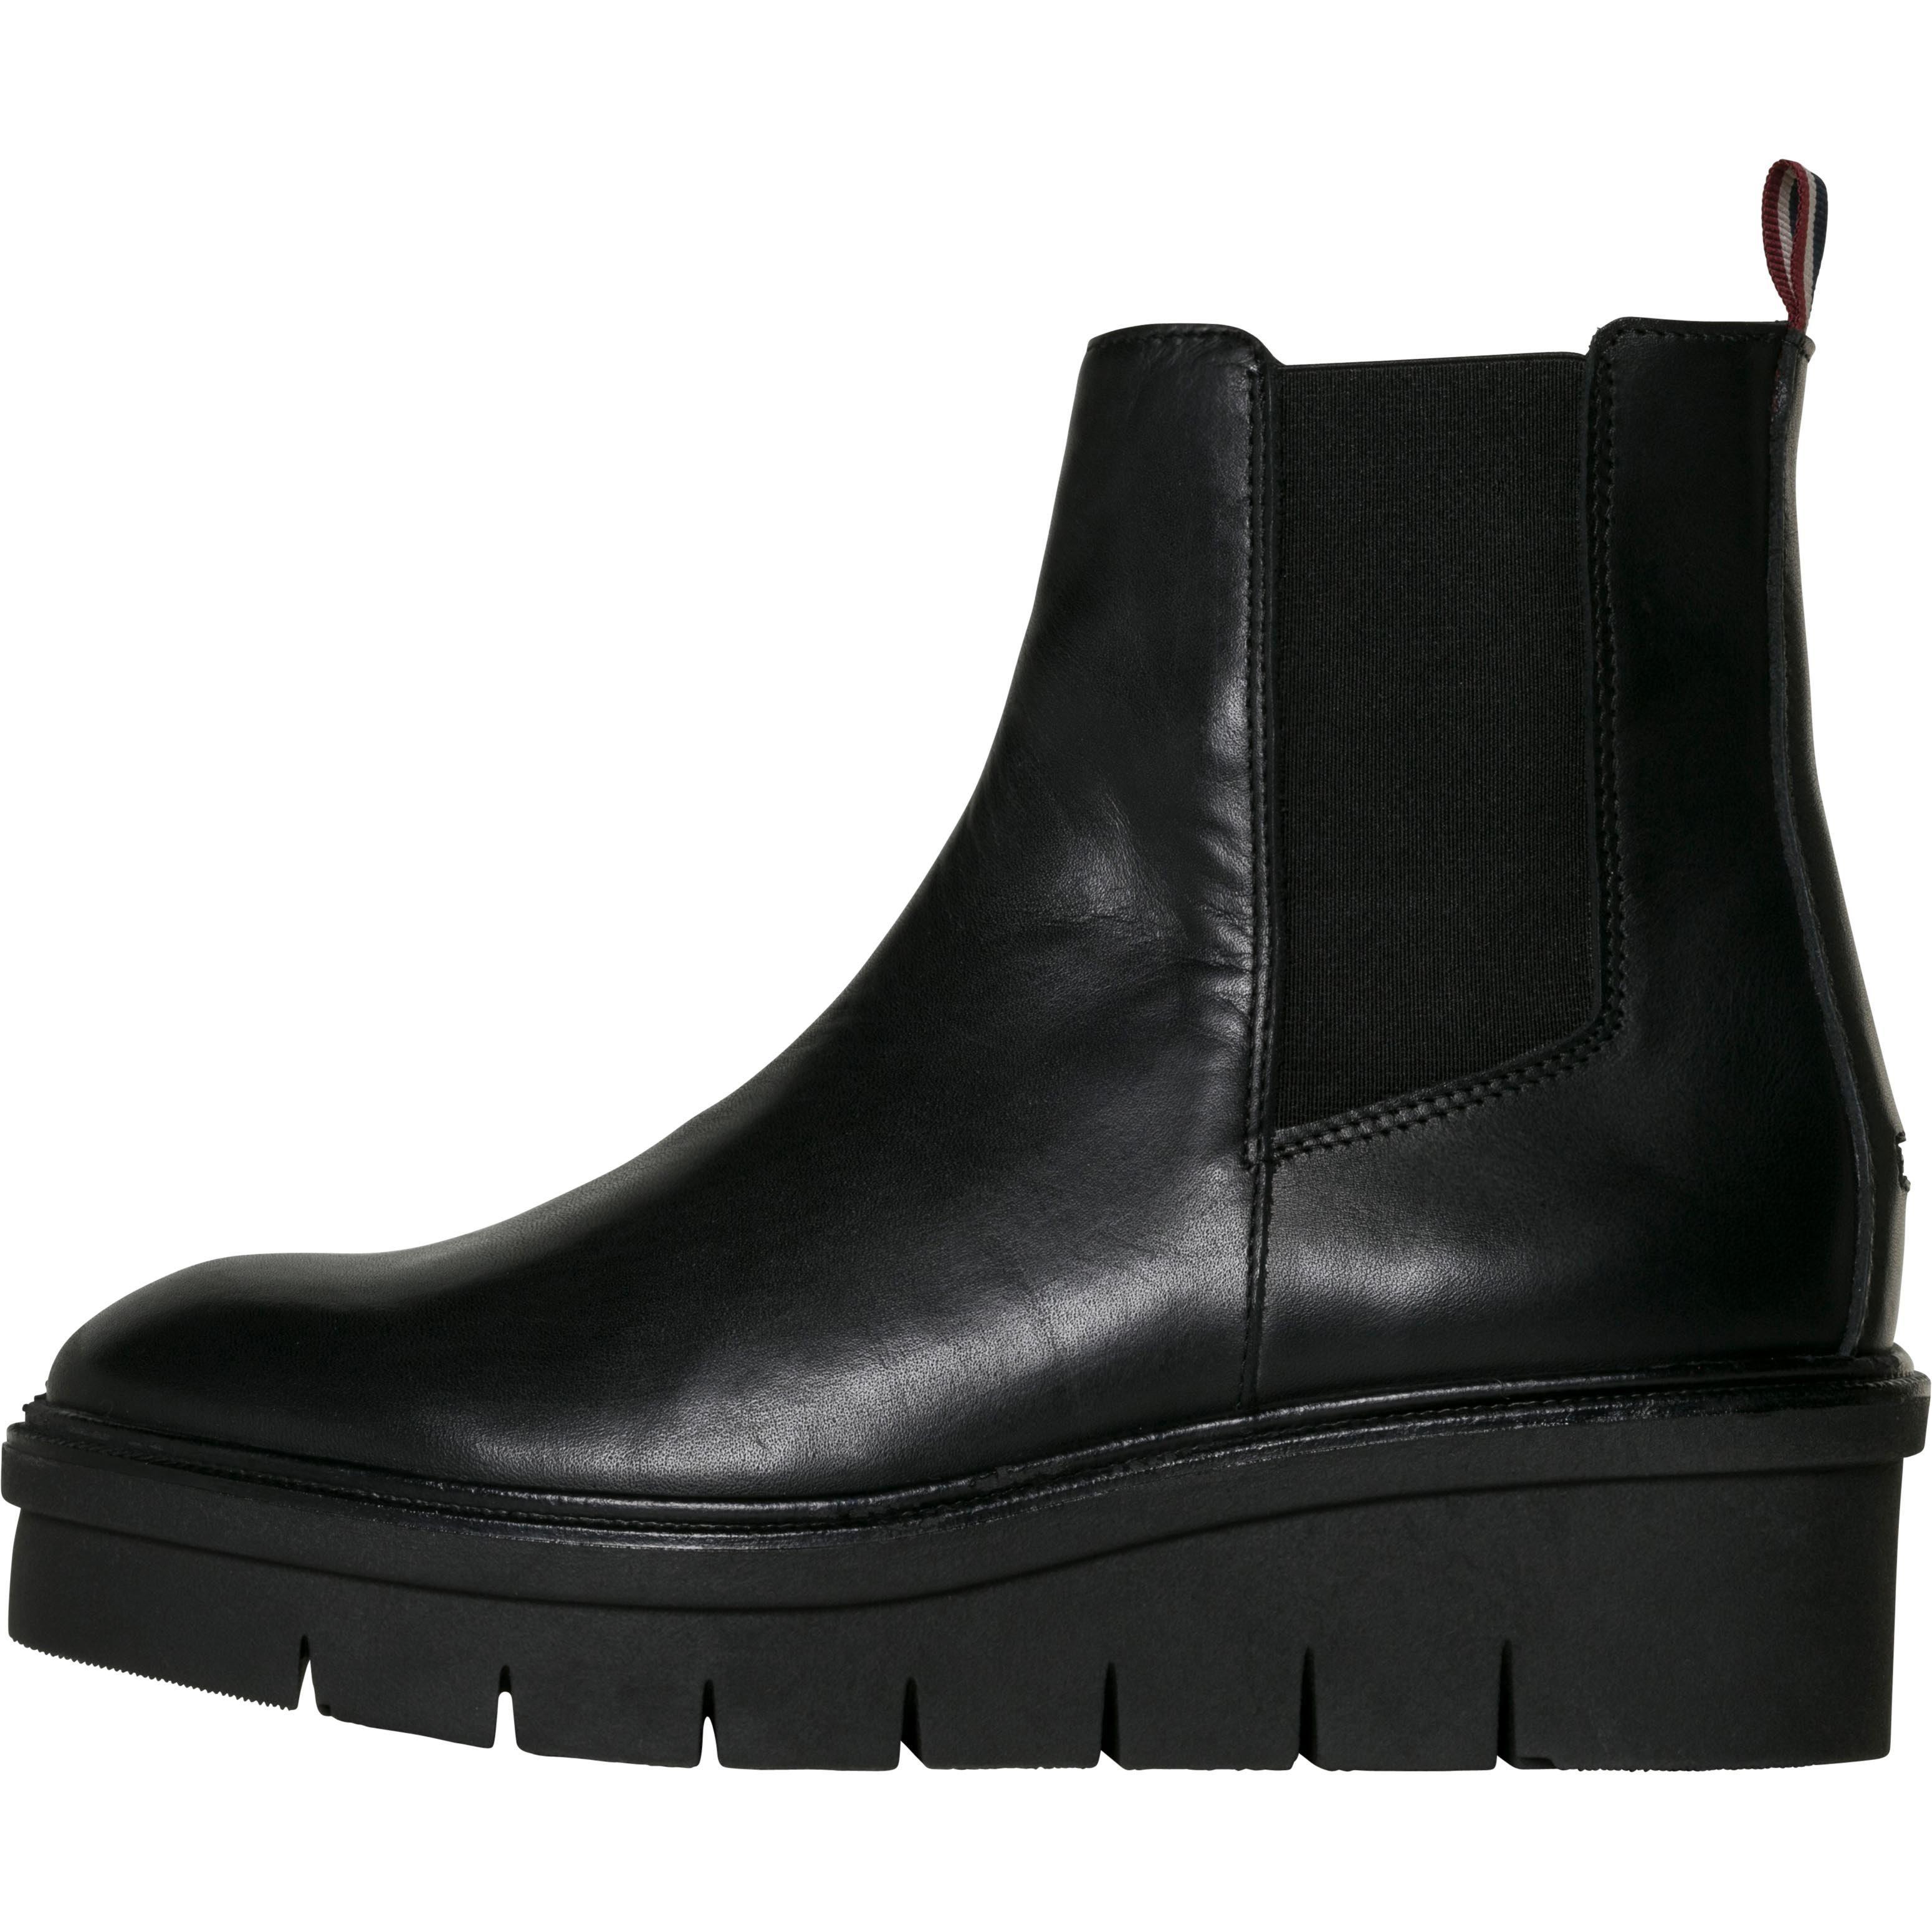 Tommy Hilfiger Boot D1385EENA 2A online kaufen  BLACK